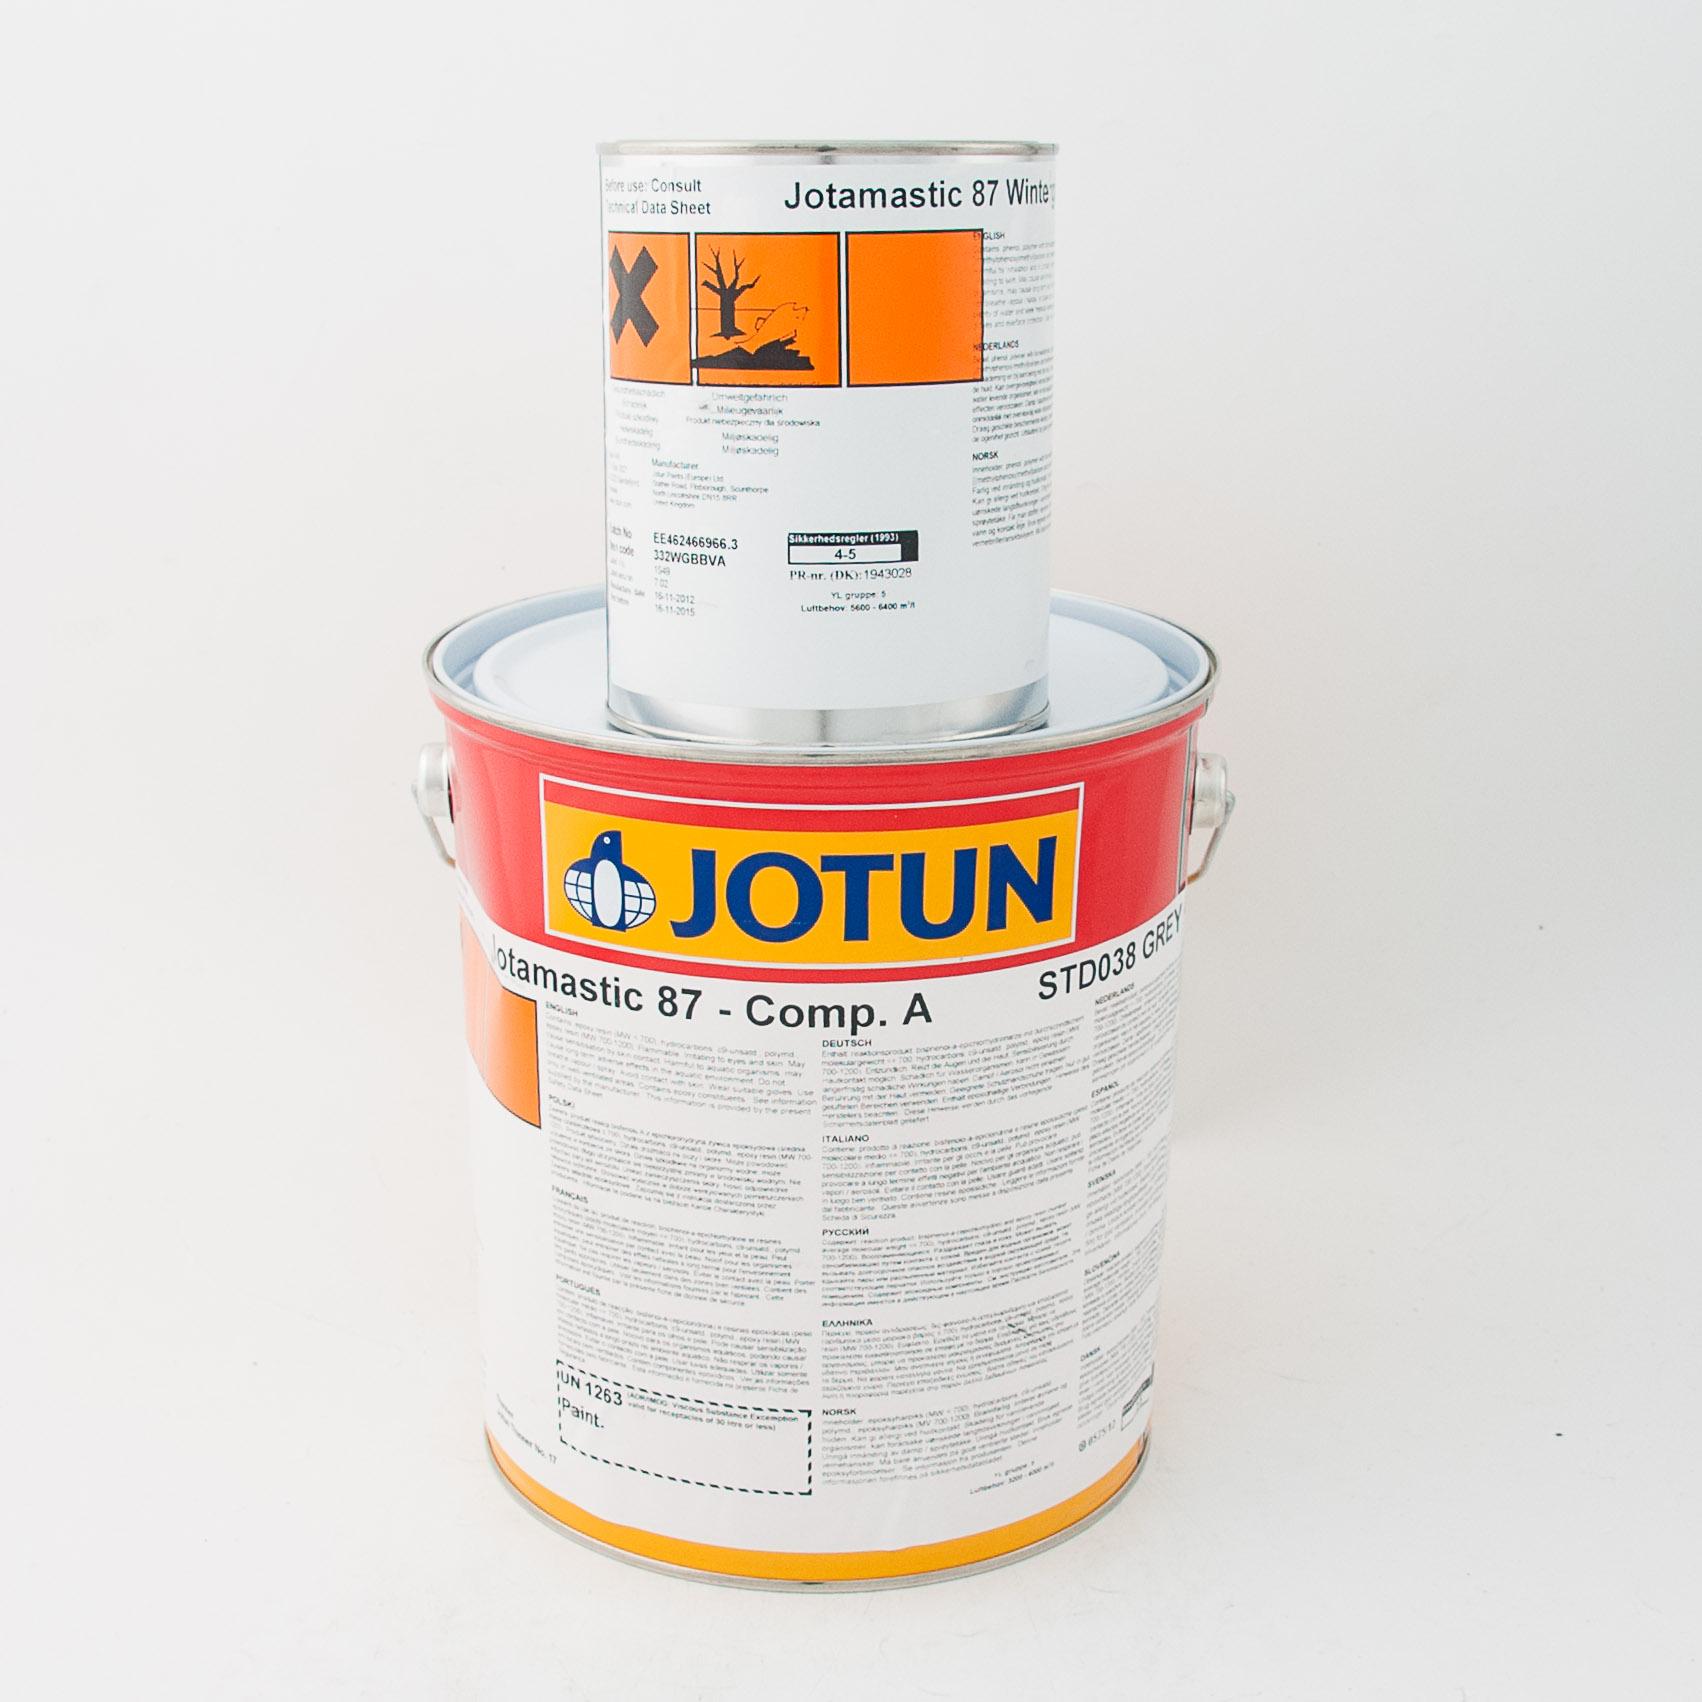 JOTUN JOTAMASTIC 87 - Surf Tolerant Epoxy Primer Image